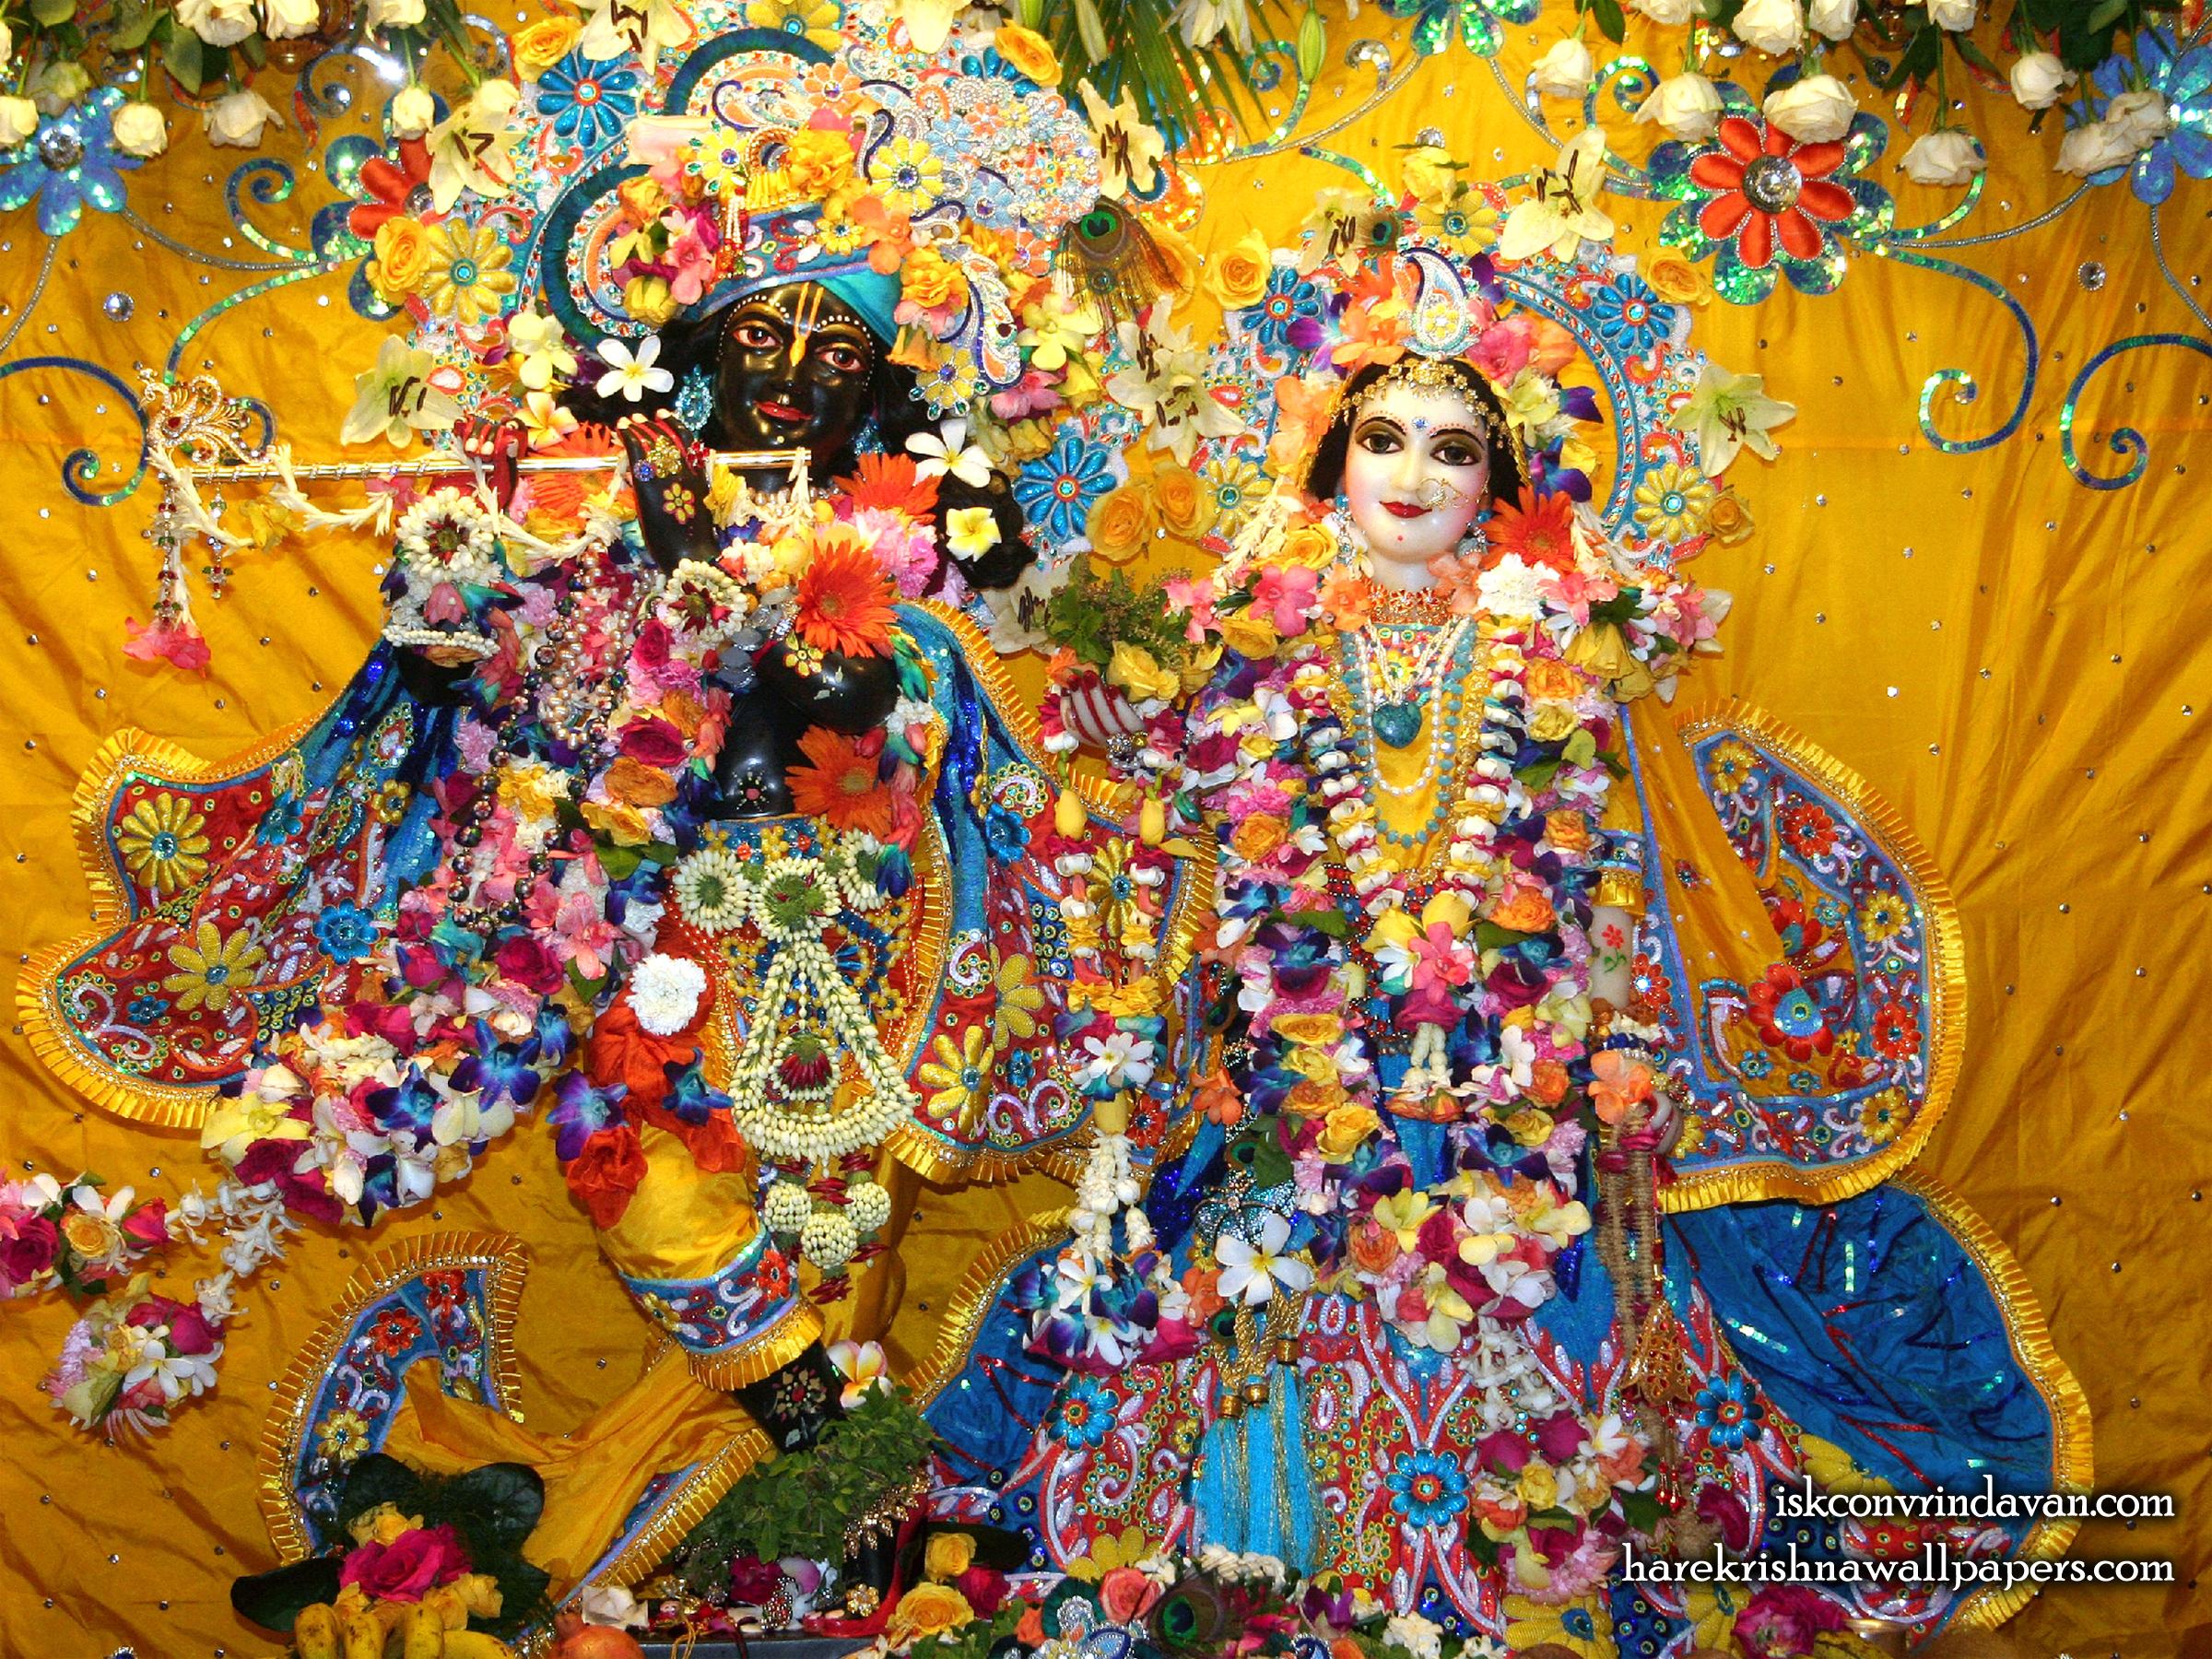 Sri Sri Radha Shyamsundar Wallpaper (013) Size 2400x1800 Download